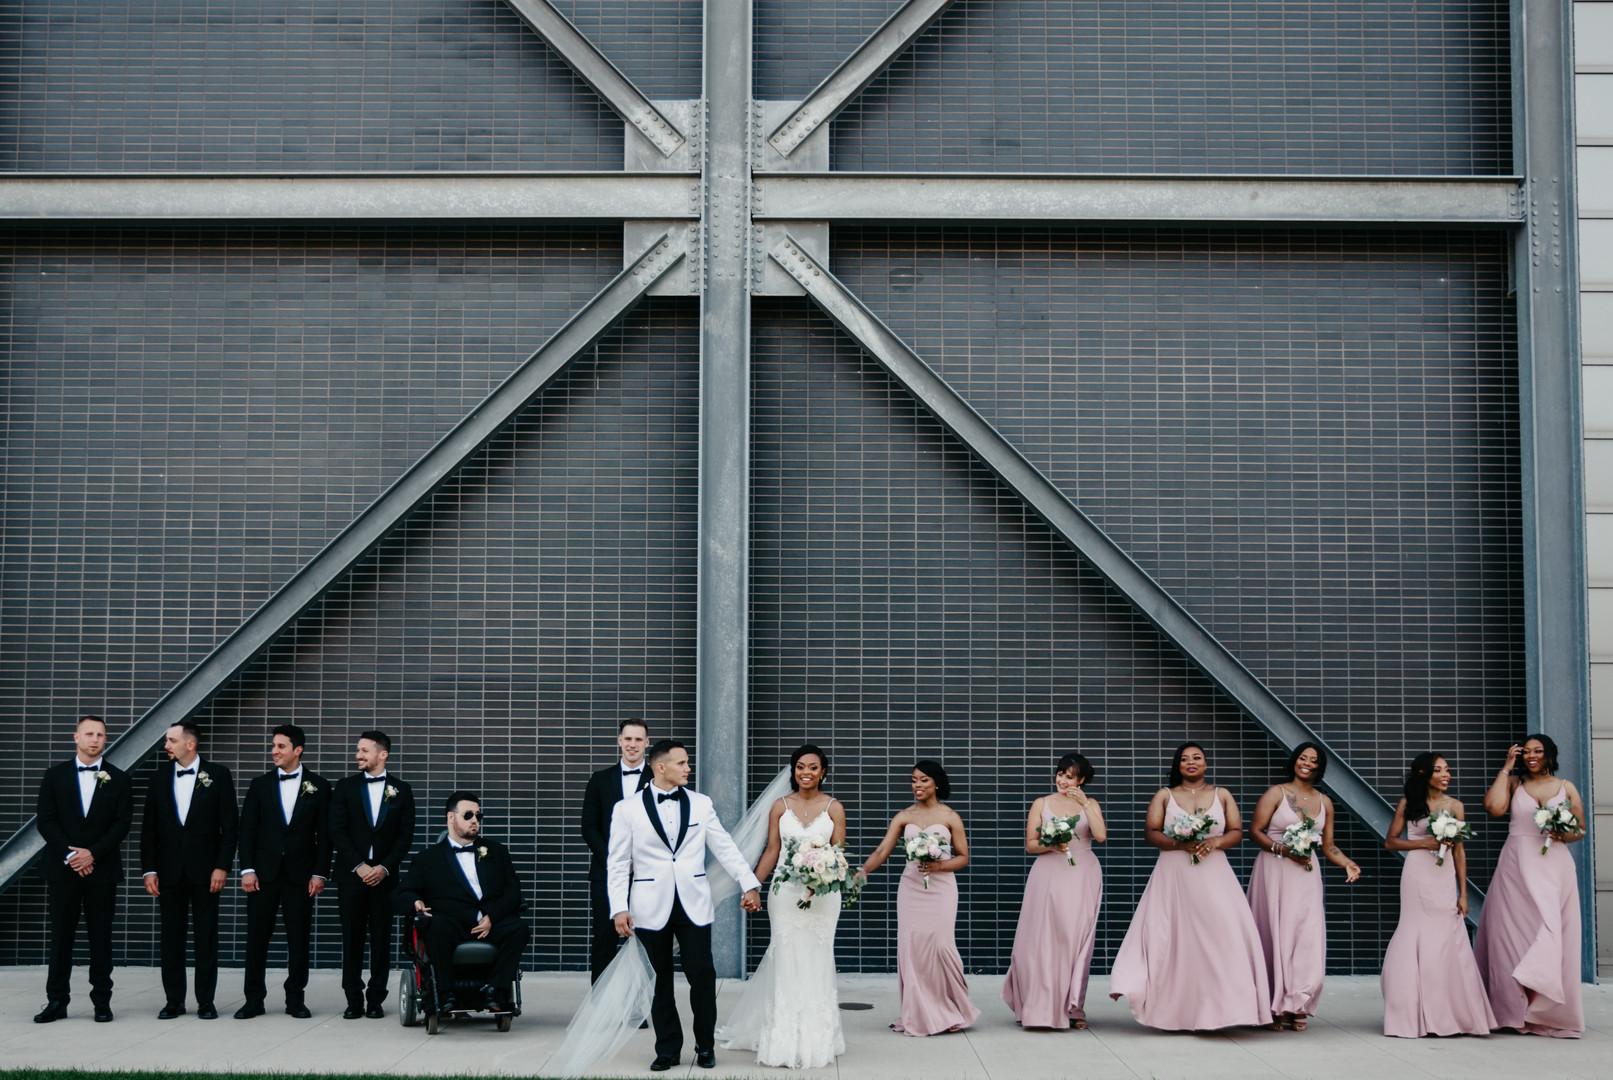 VillarrealProspere_Villarreal_MariaCampbellPhotography_WeddingParty2of48_big.jpg